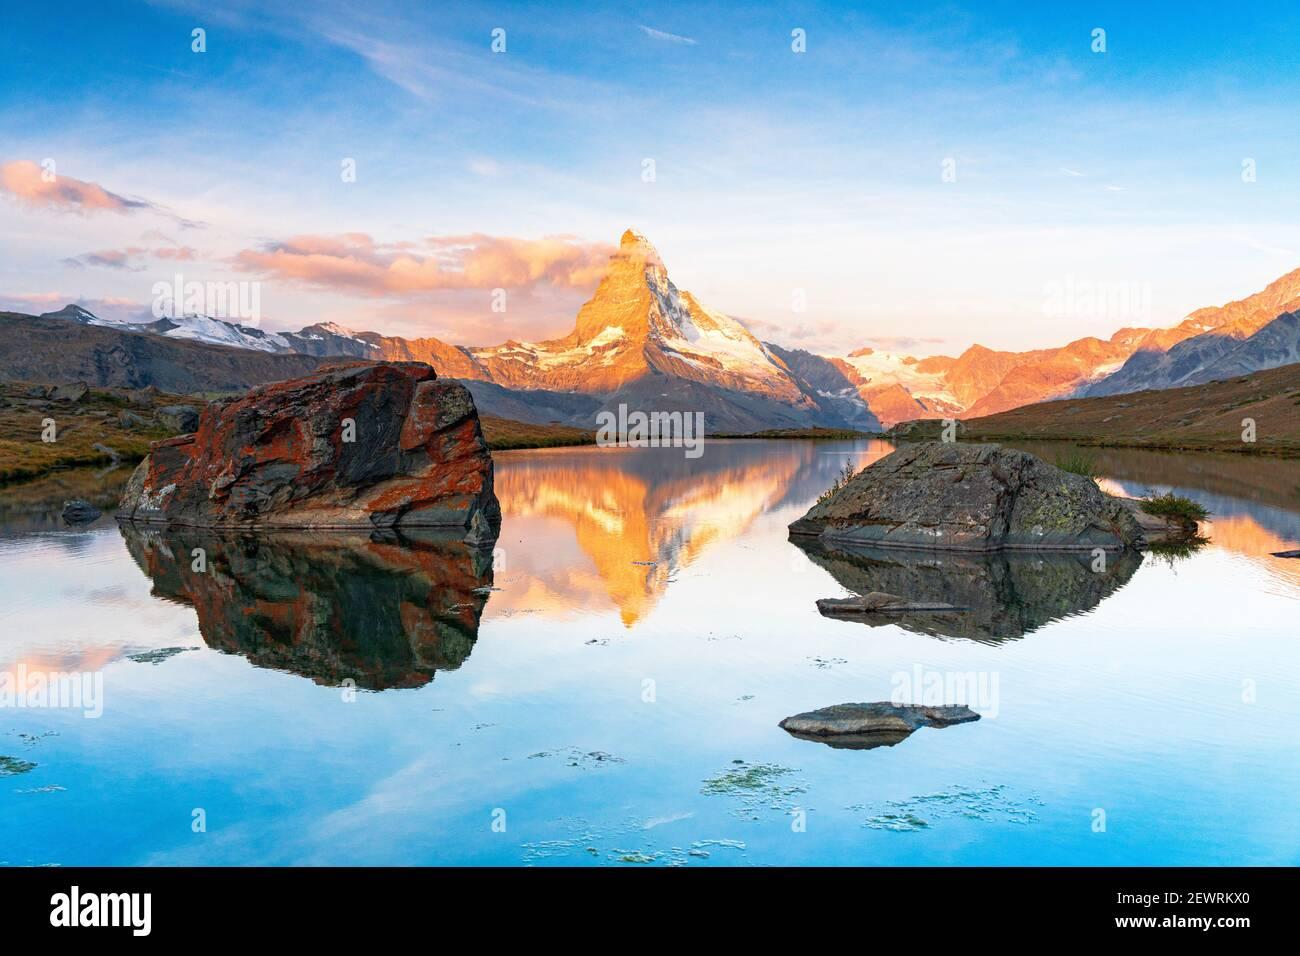 Matterhorn lit by sunrise reflected in the calm water of lake Stellisee, Zermatt, Valais Canton, Switzerland, Europe Stock Photo